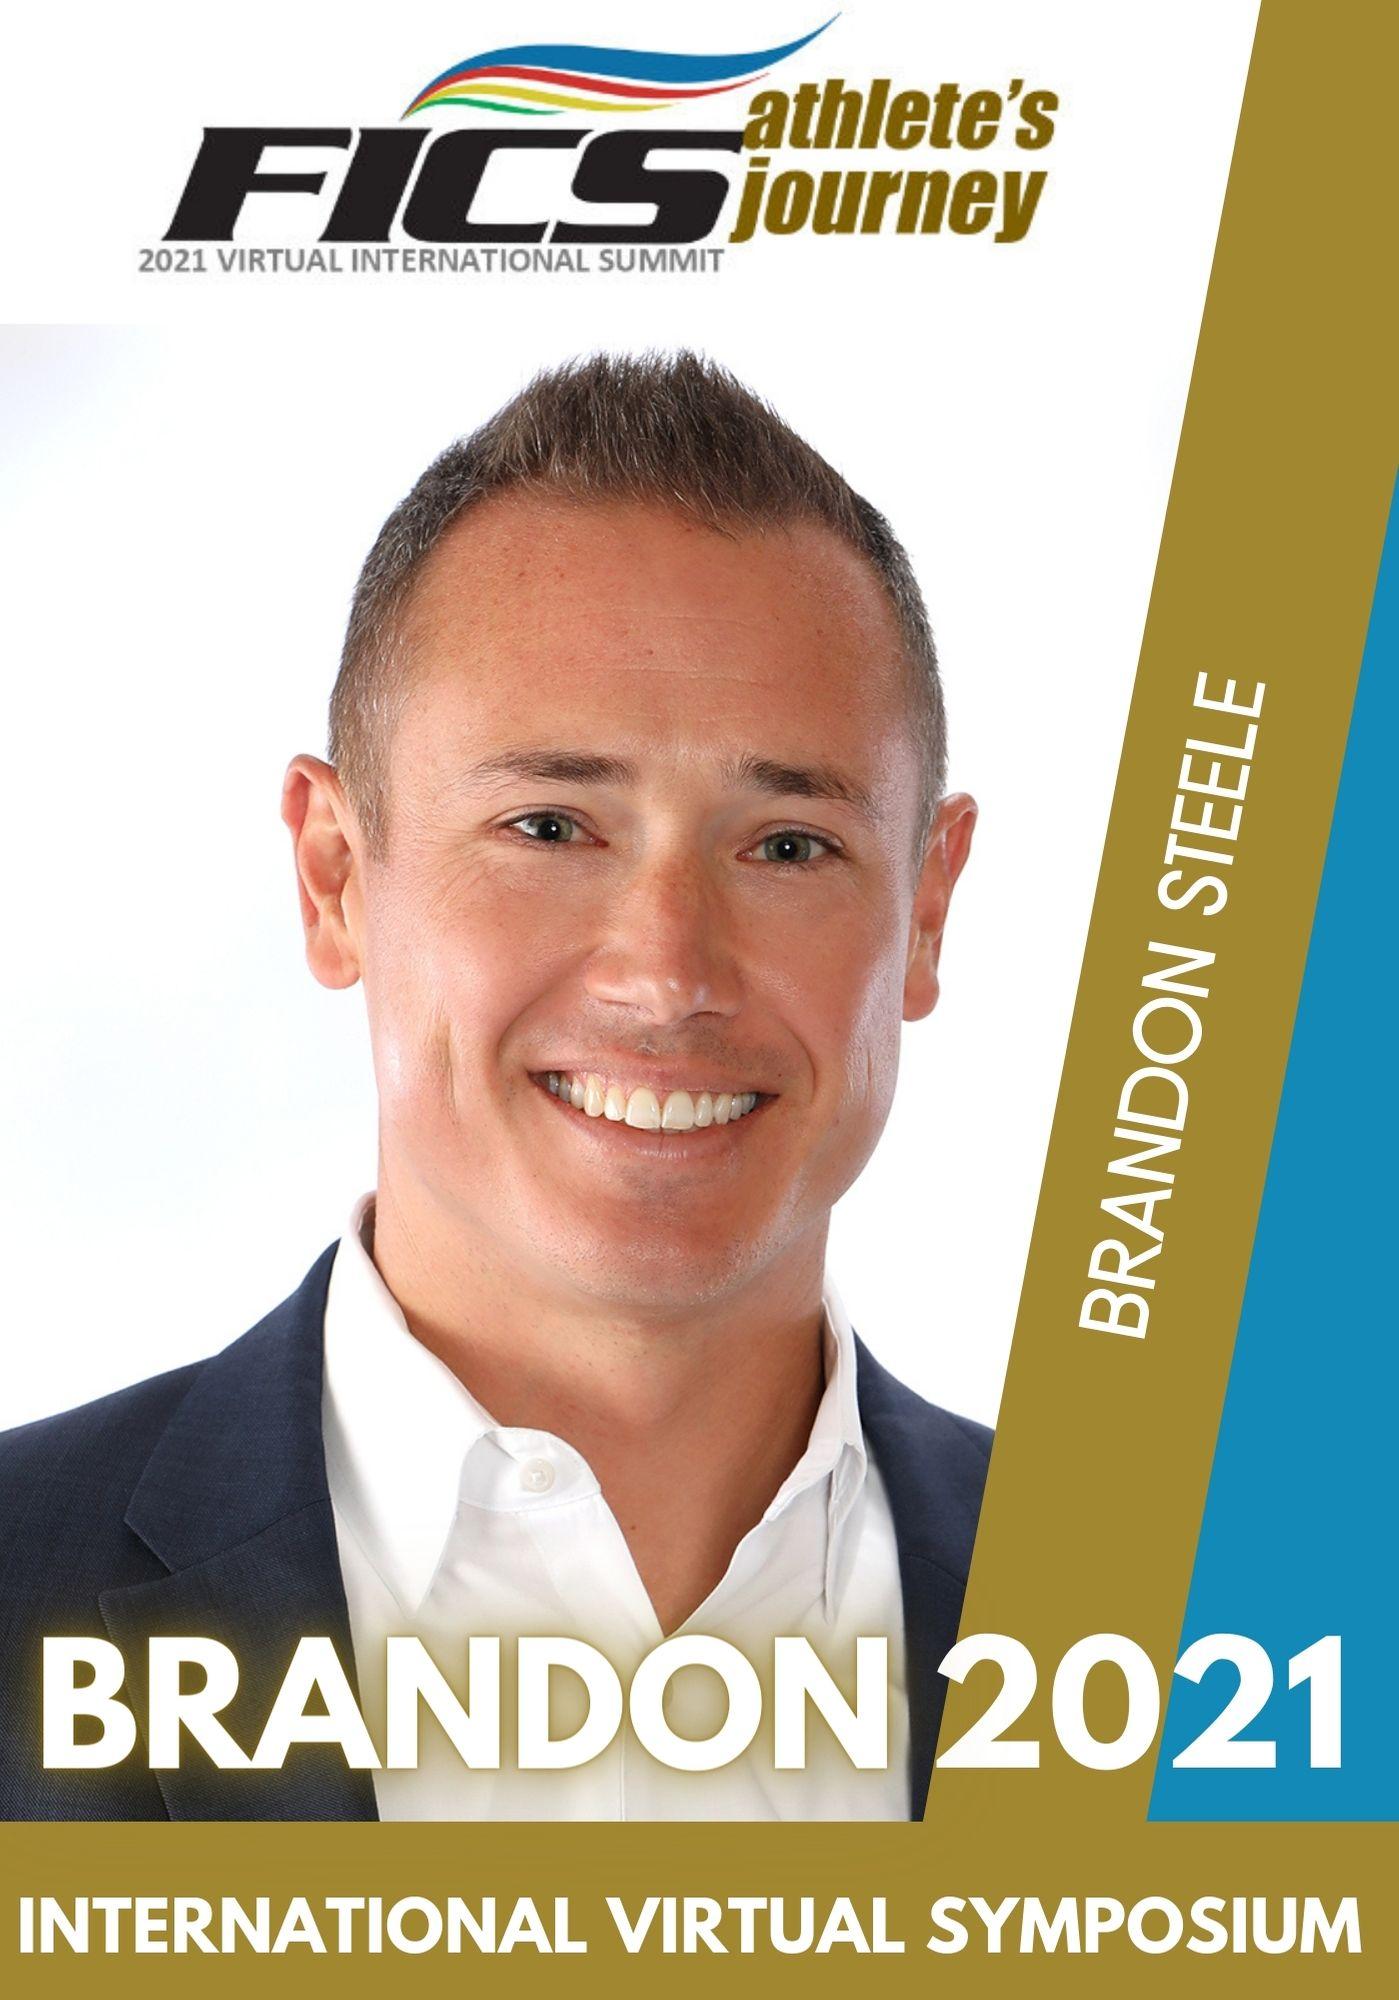 Brandon Steele